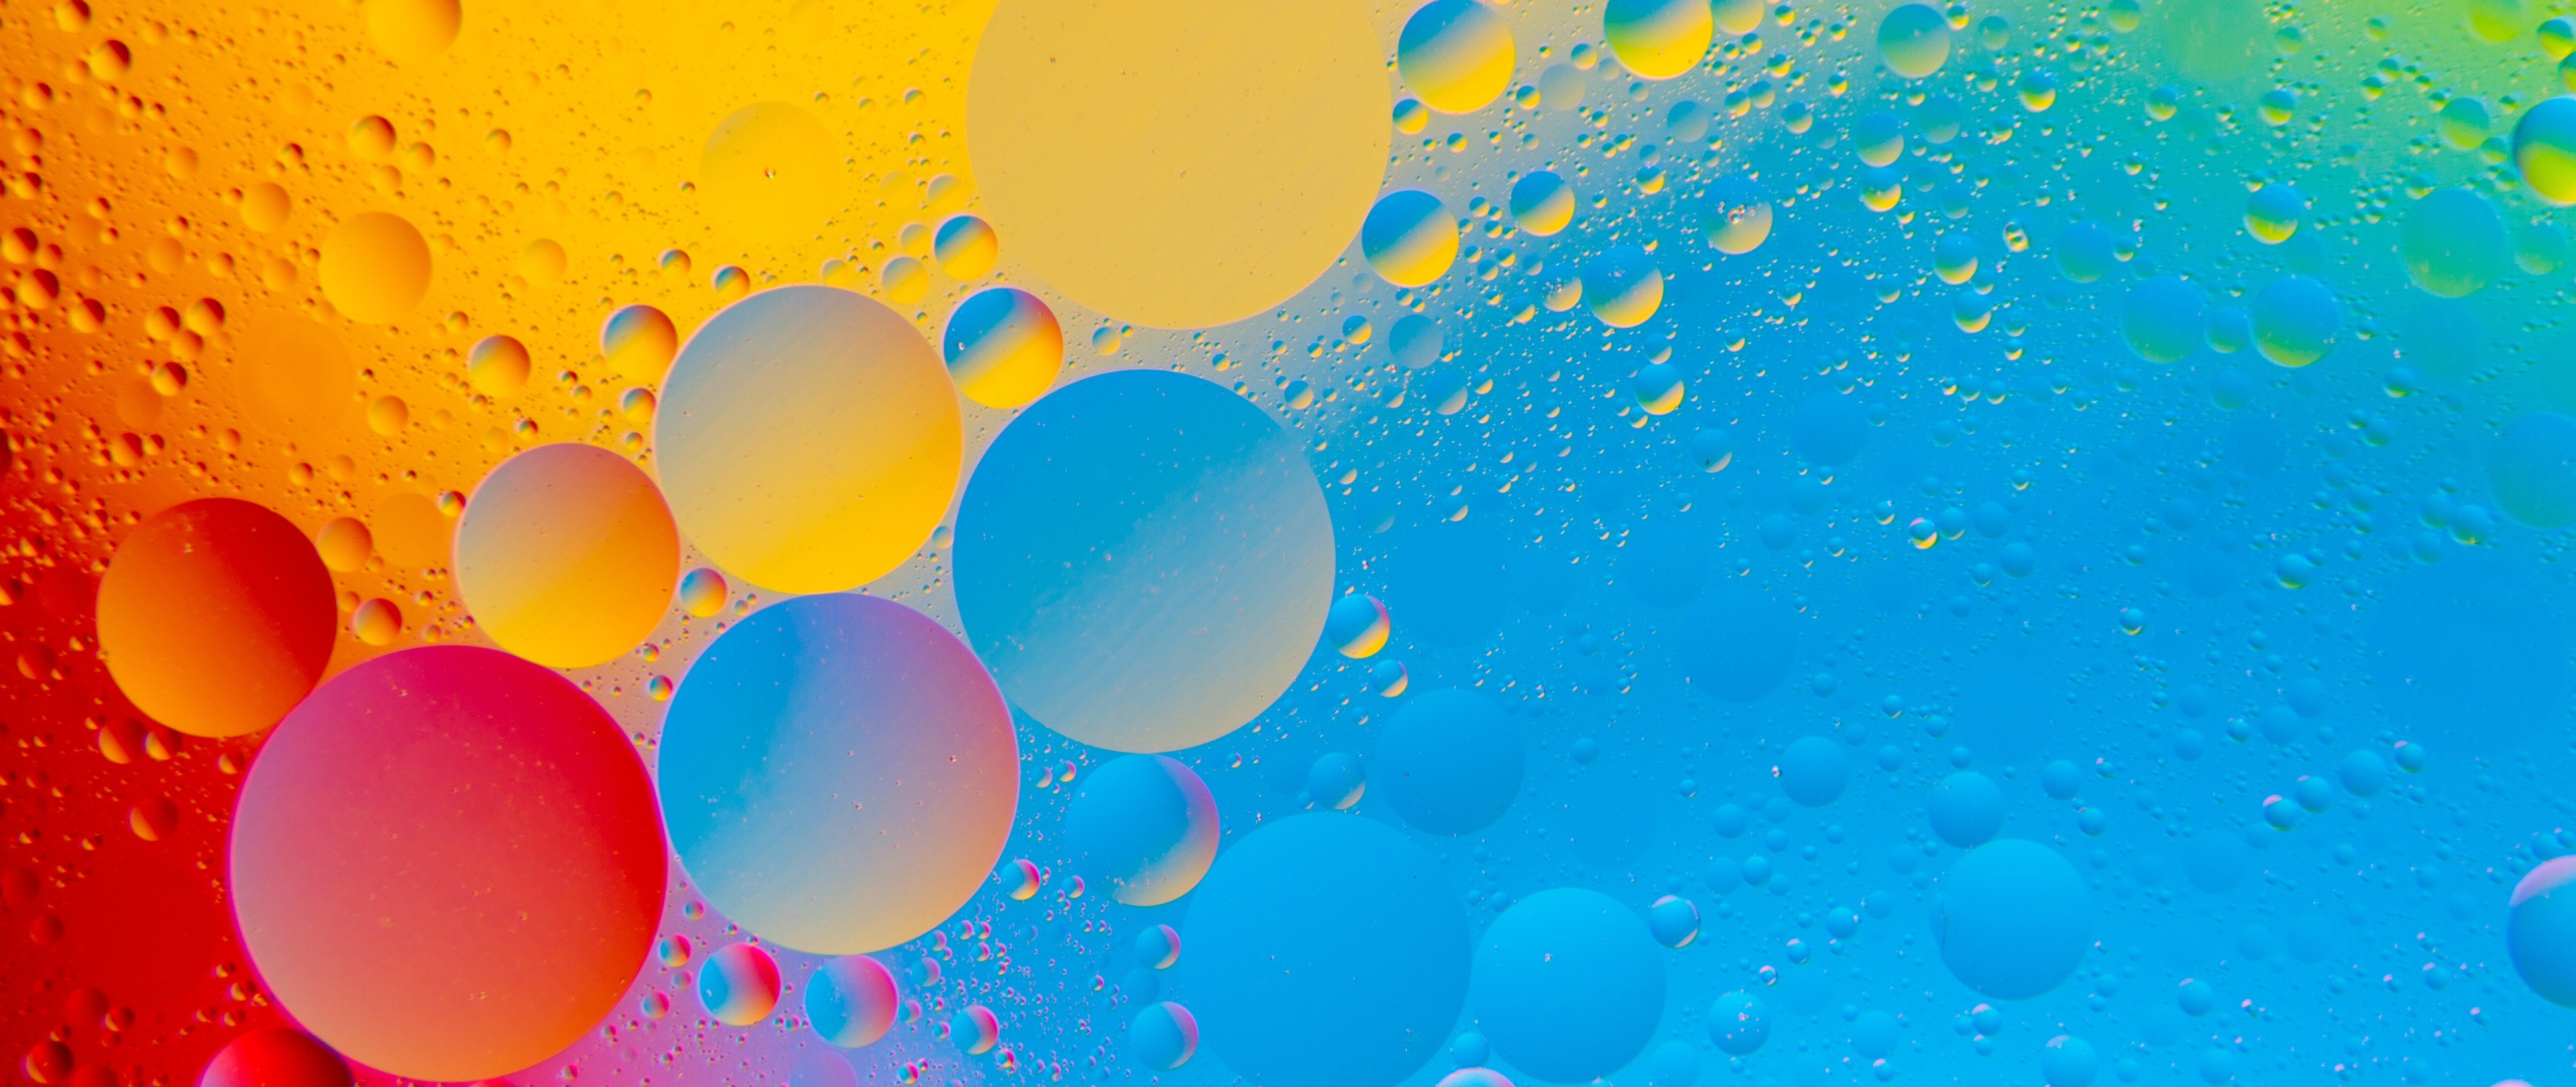 Abstract Painting 4k Hd Desktop Wallpaper For 4k Ultra Hd: Colourful Bubbles 4K HD Abstract Wallpaper 4K Ultra HD